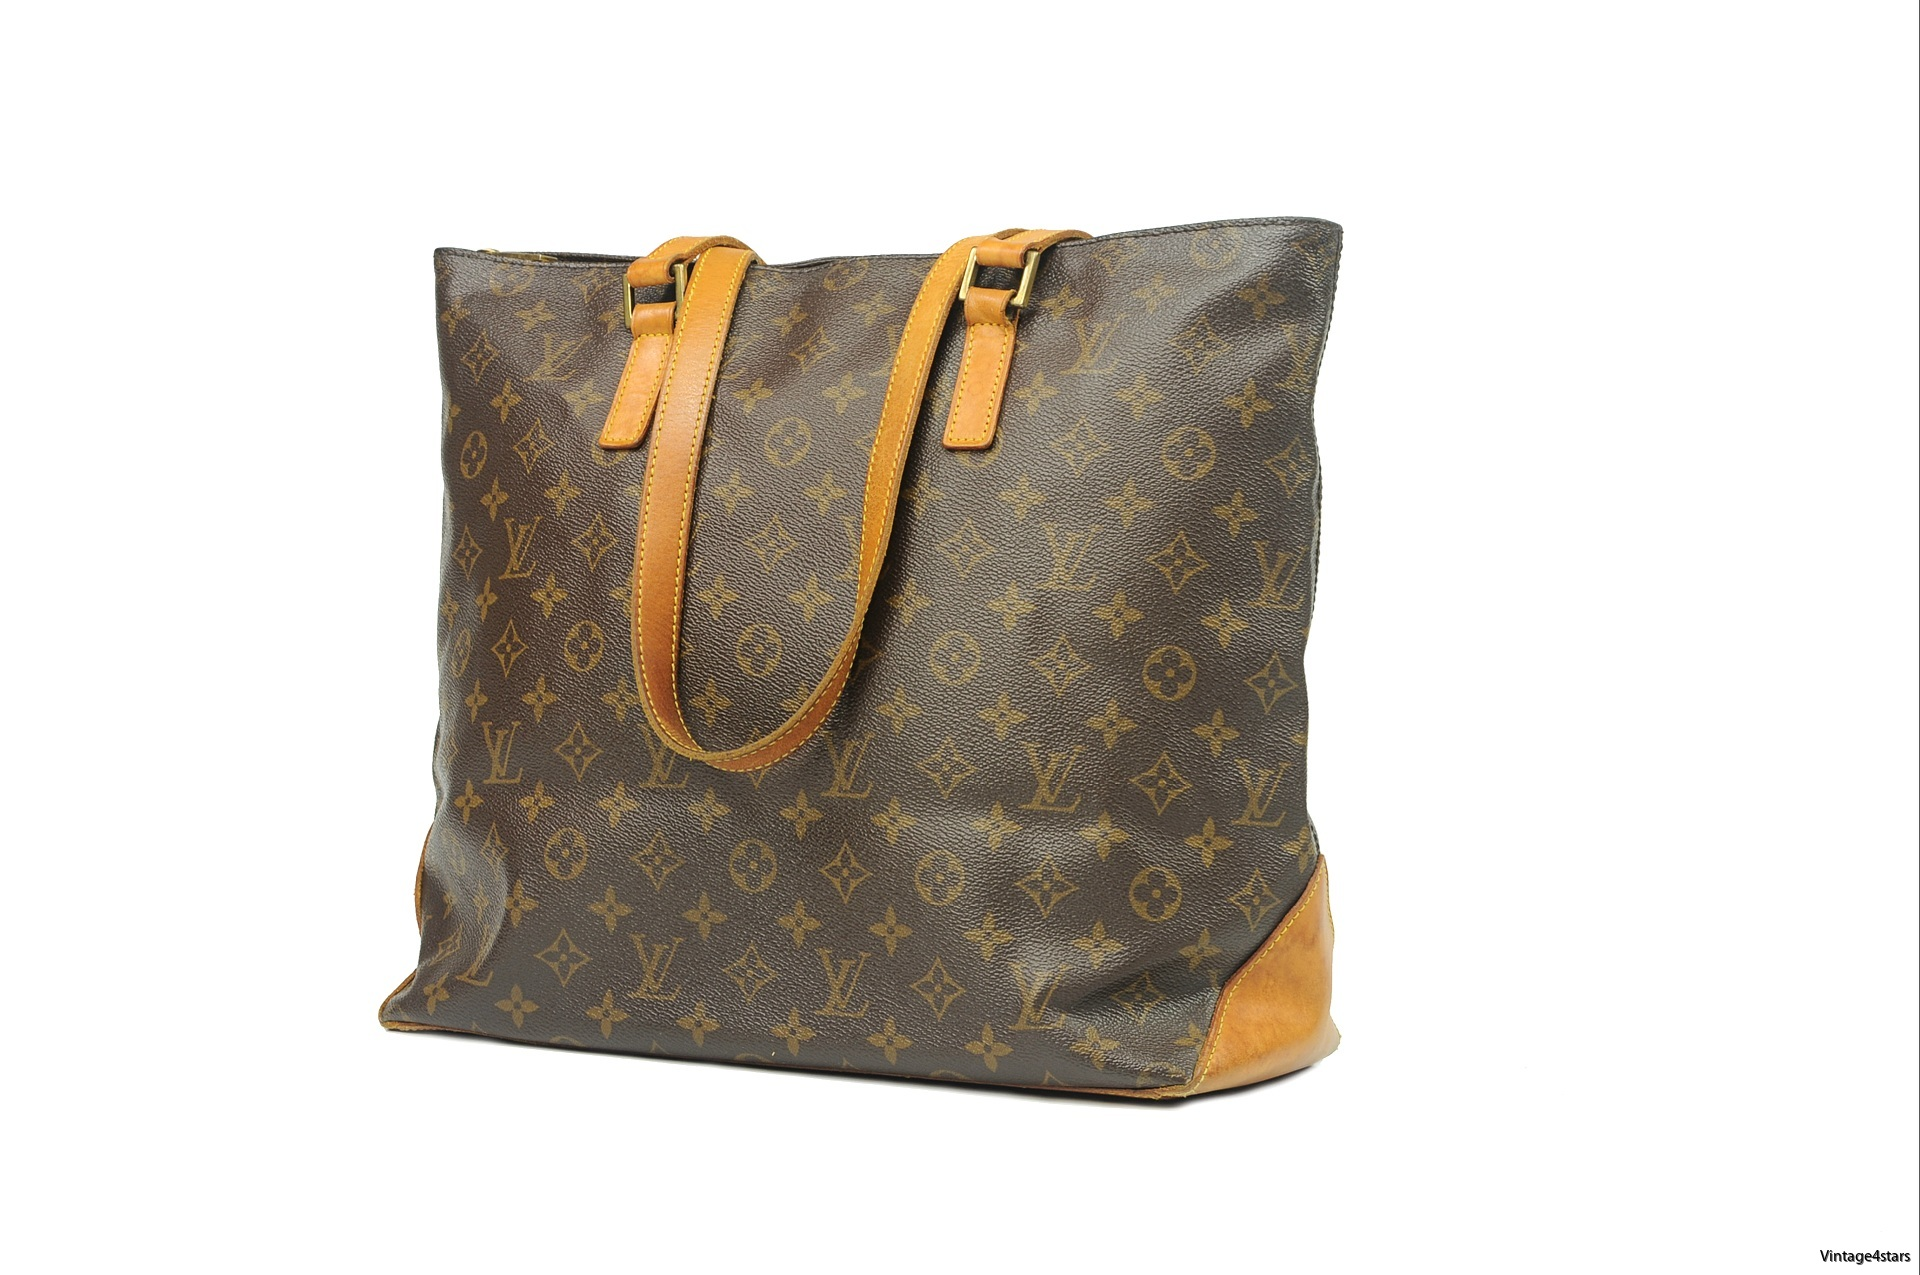 Louis Vuitton Cabas Mezzo 2